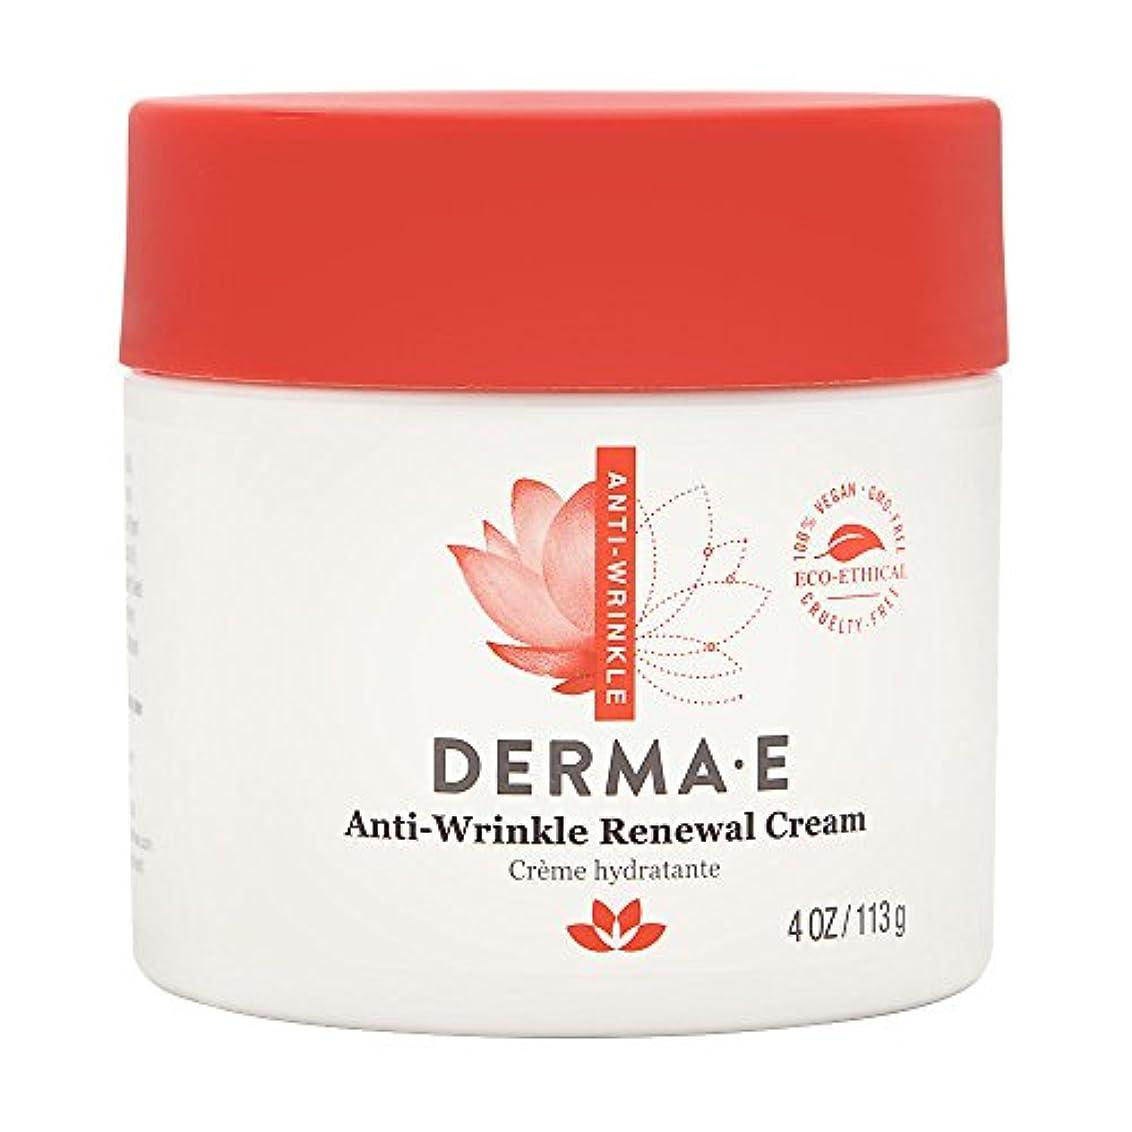 Derma E, Anti-Wrinkle Vitamin A Retinyl Palmitate Cream, 4 oz (113 g)